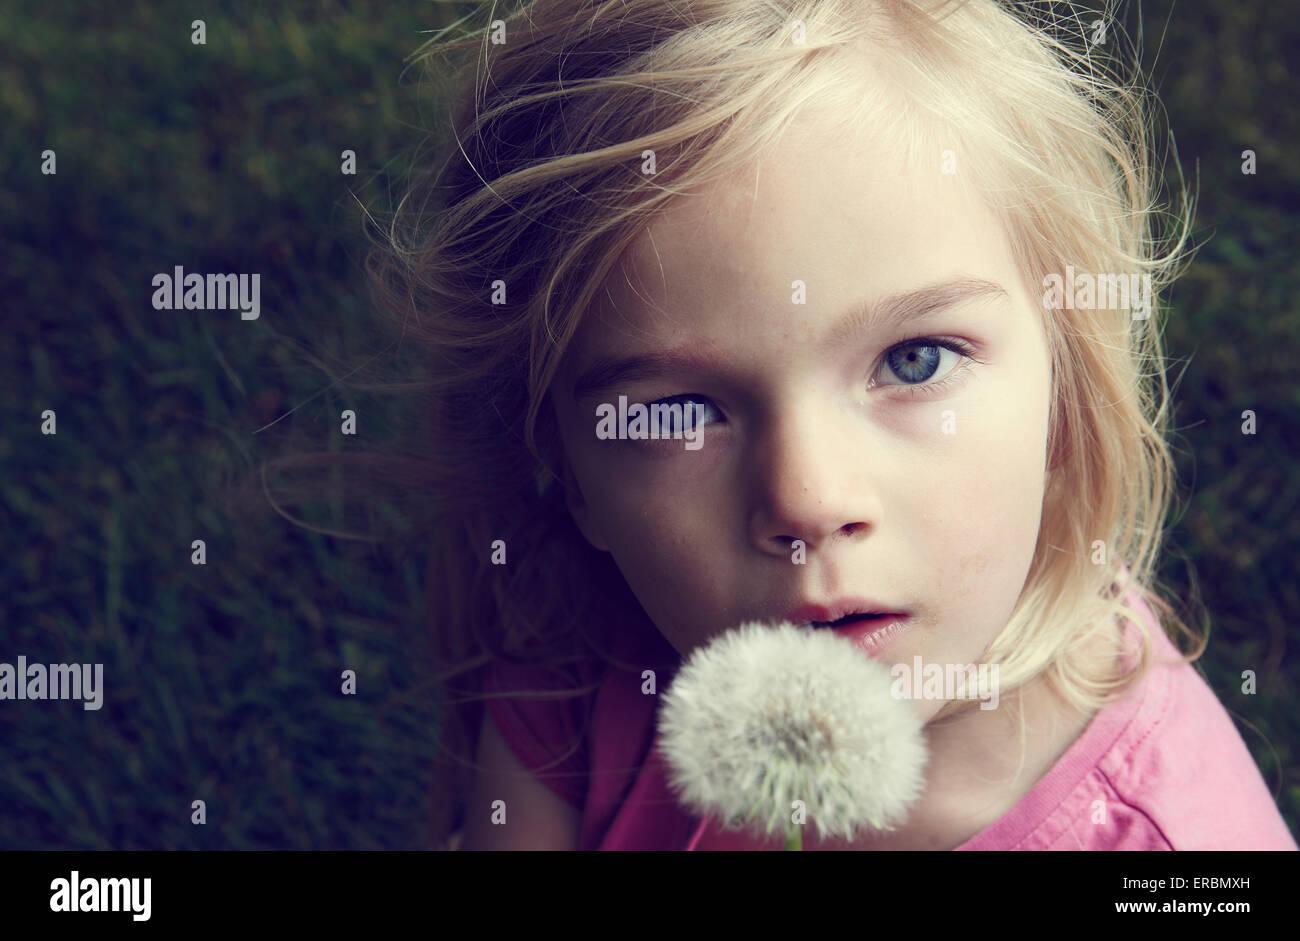 Portrait of caucasian blond girl blowing flower dandelion seeds - Stock Image